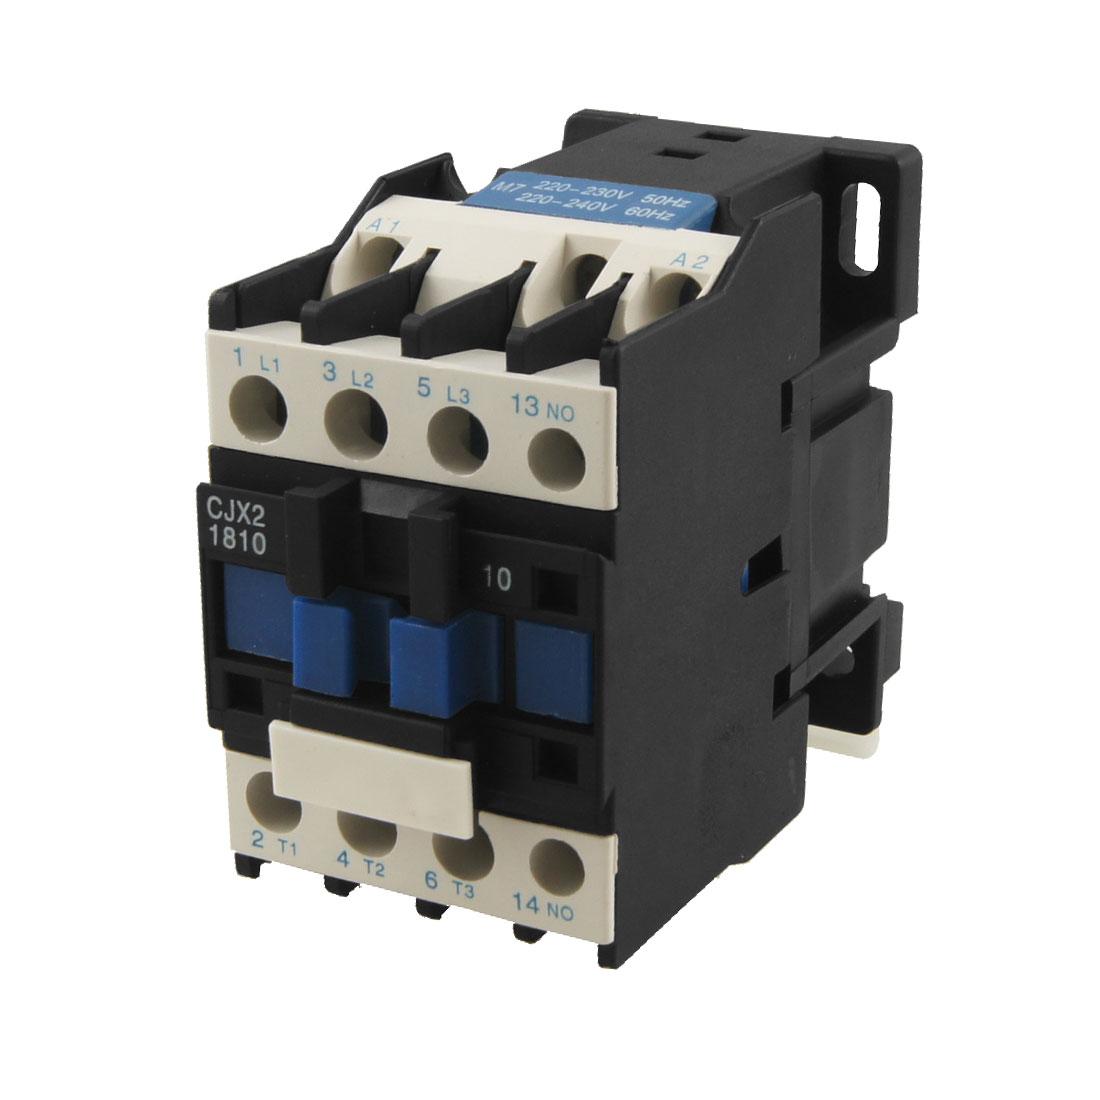 CJX2-1810 AC Contactor 18A 3 Phase 3-Pole NO 220V 50/60Hz Coil